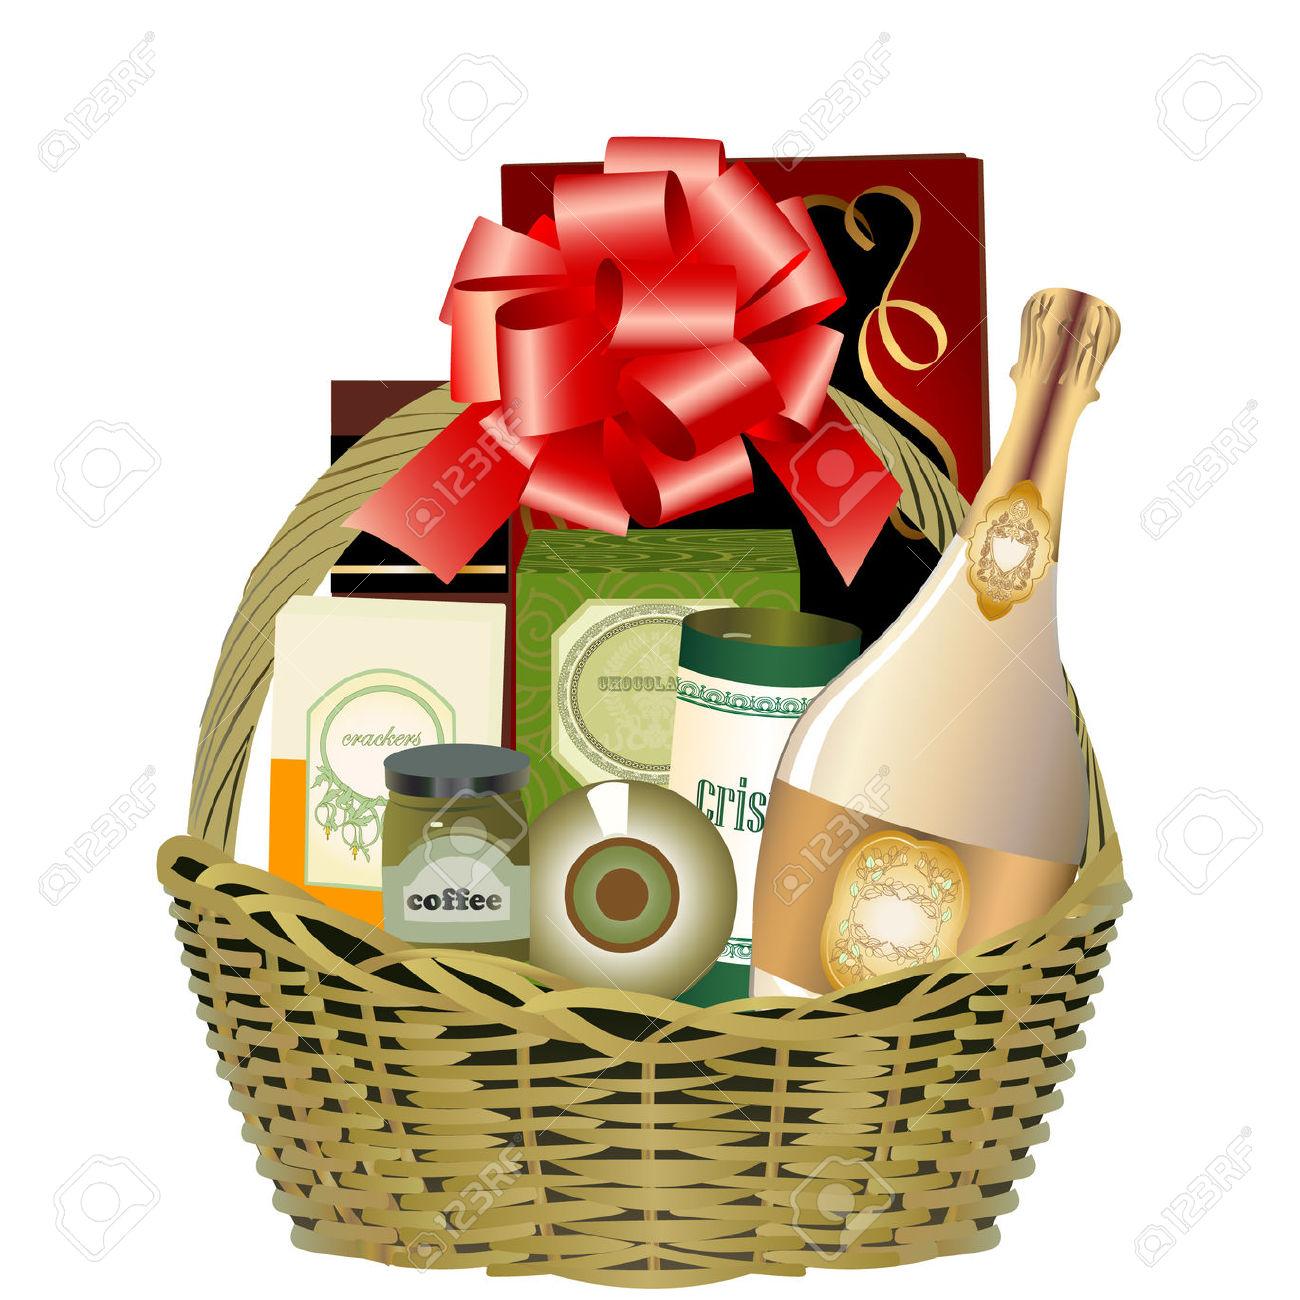 Gift Basket Clip Art #11042